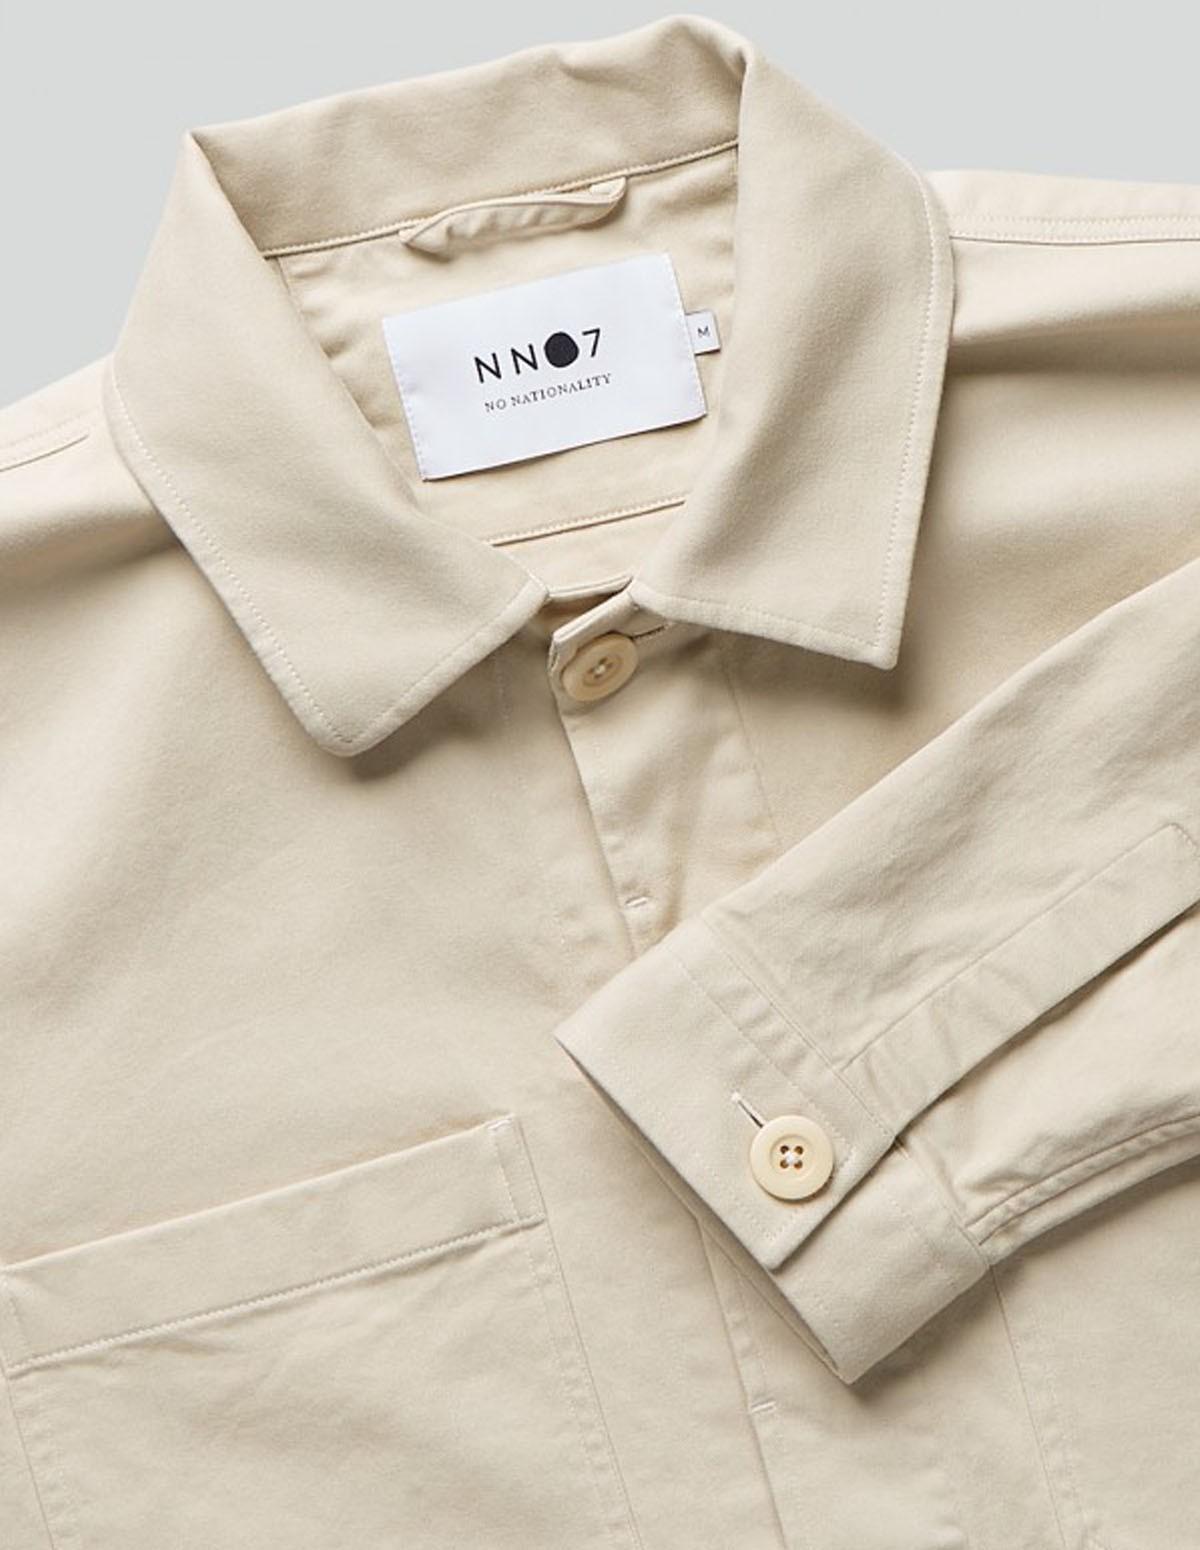 Nn07 Bernie 1420 Jacket